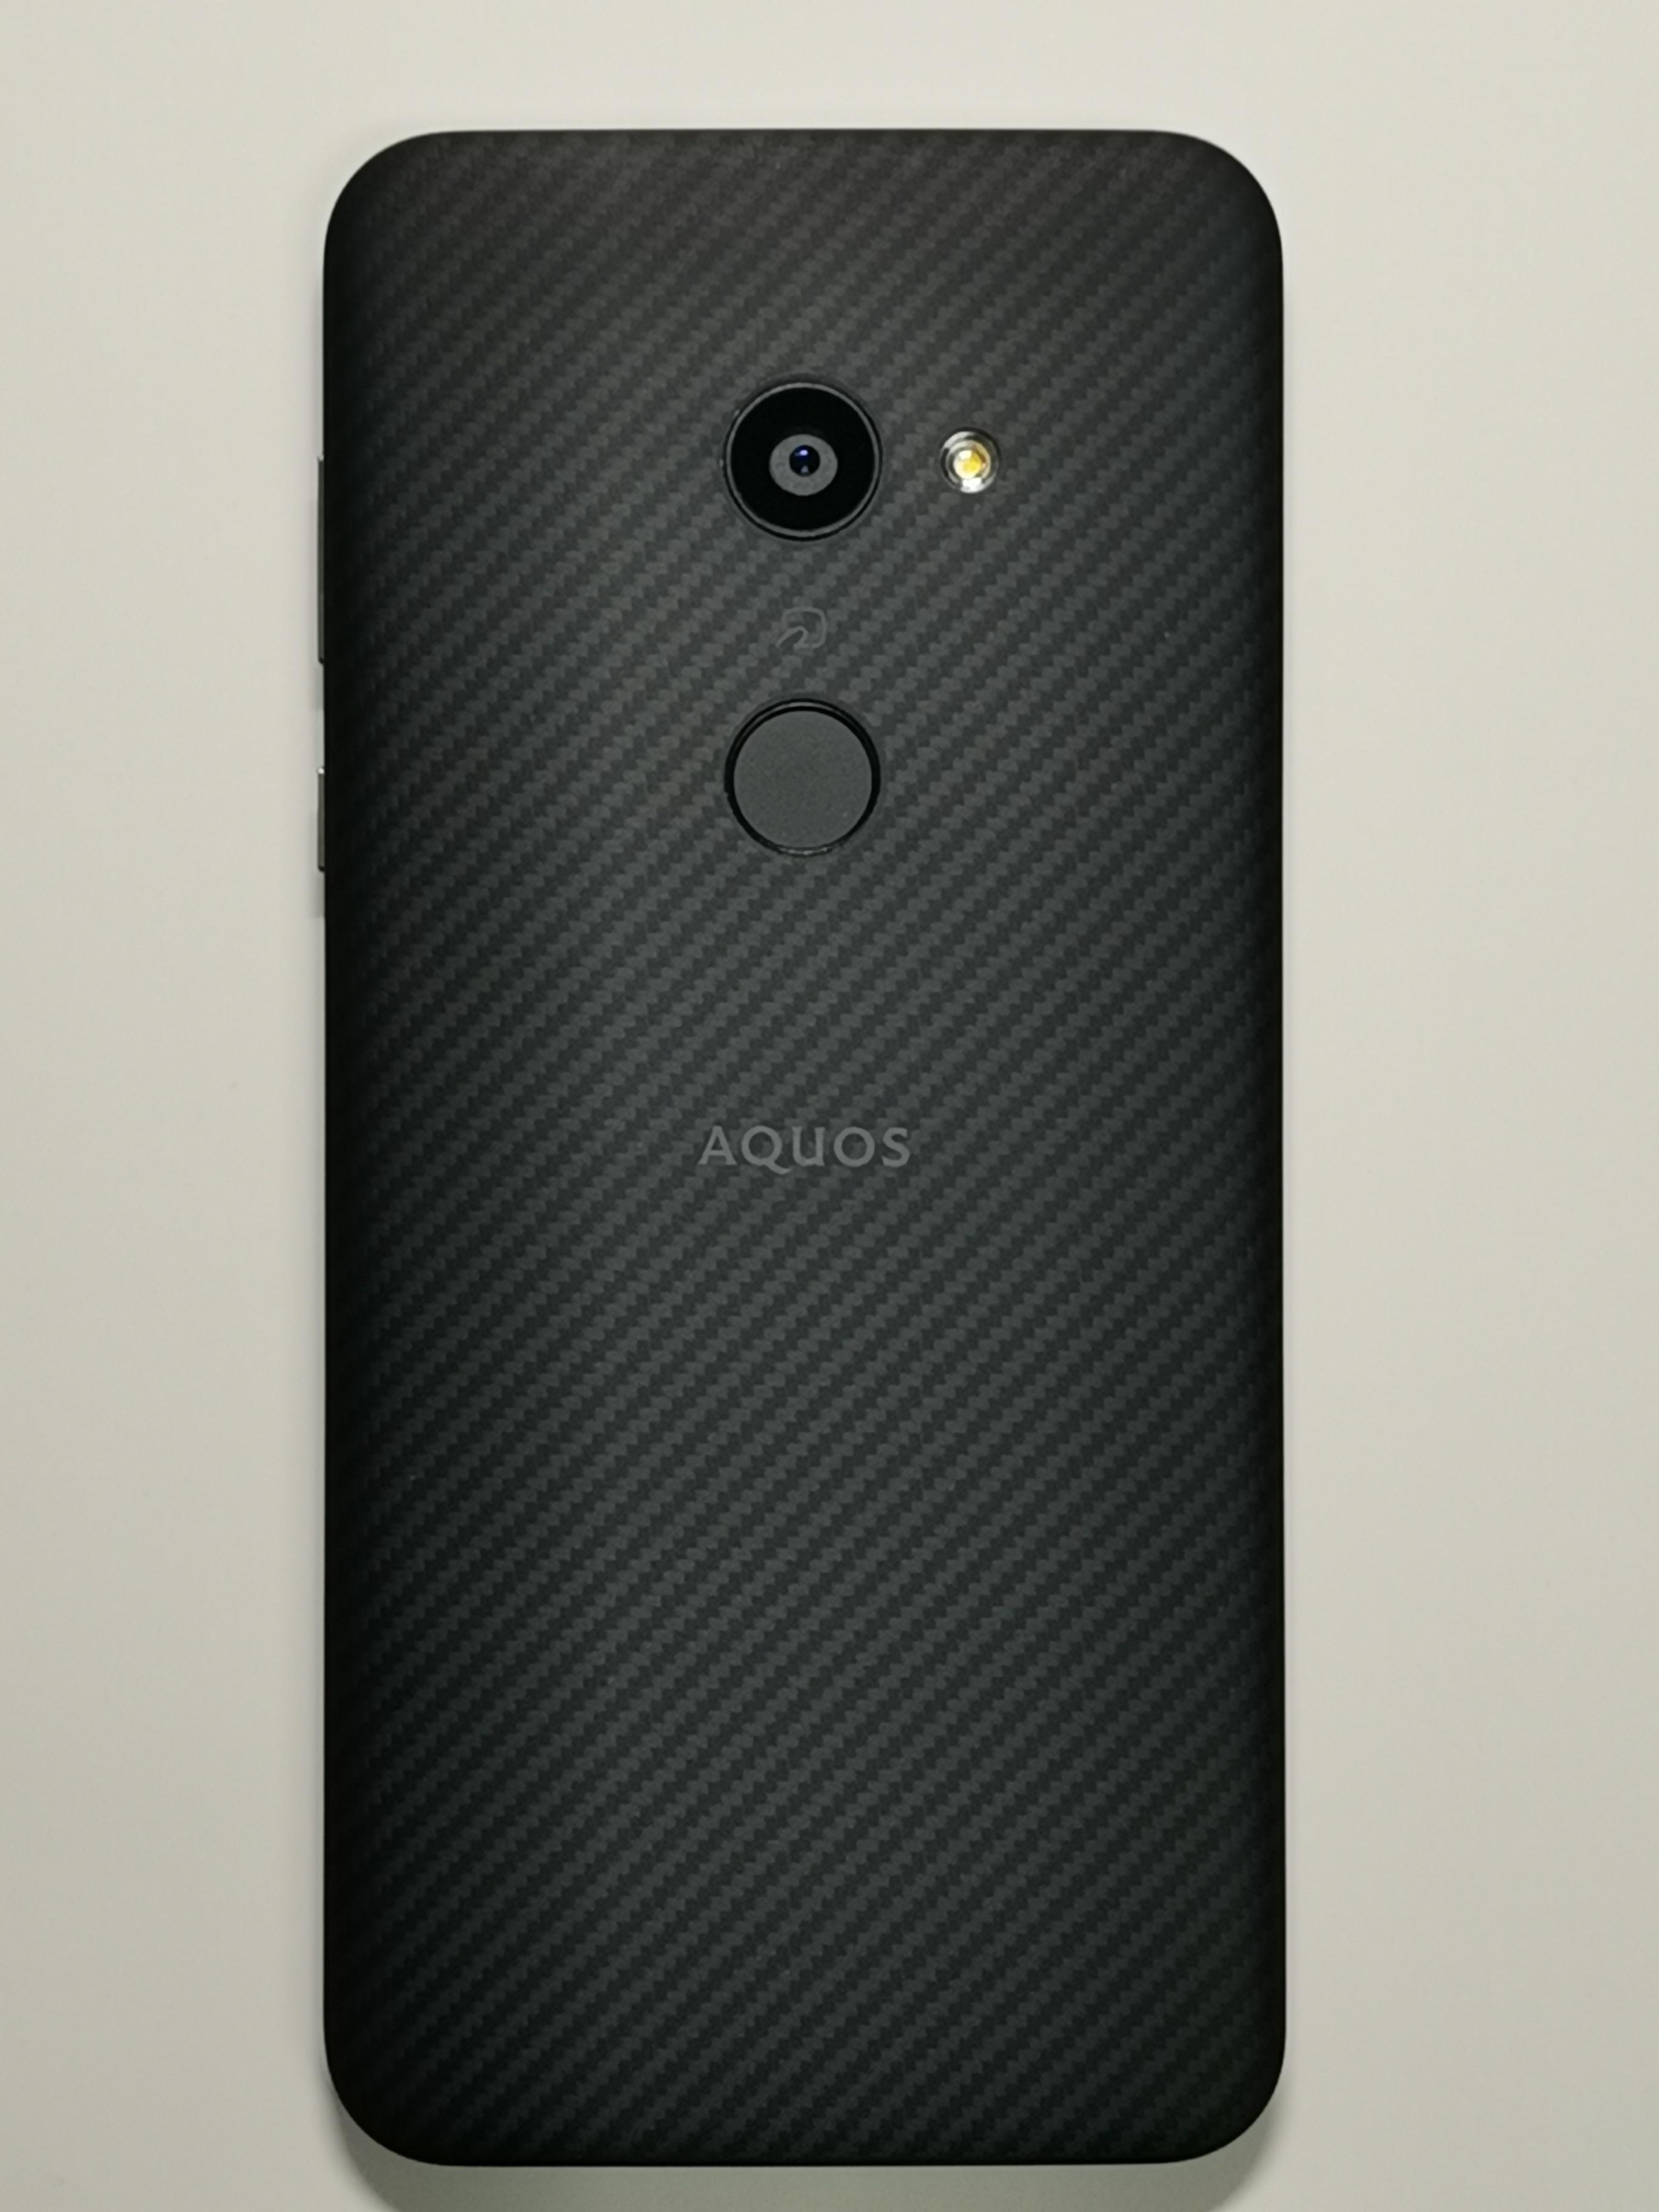 AQUOS zero 徹底レビュー・評価・評判-軽くて通常使用に最適、不満点もあり